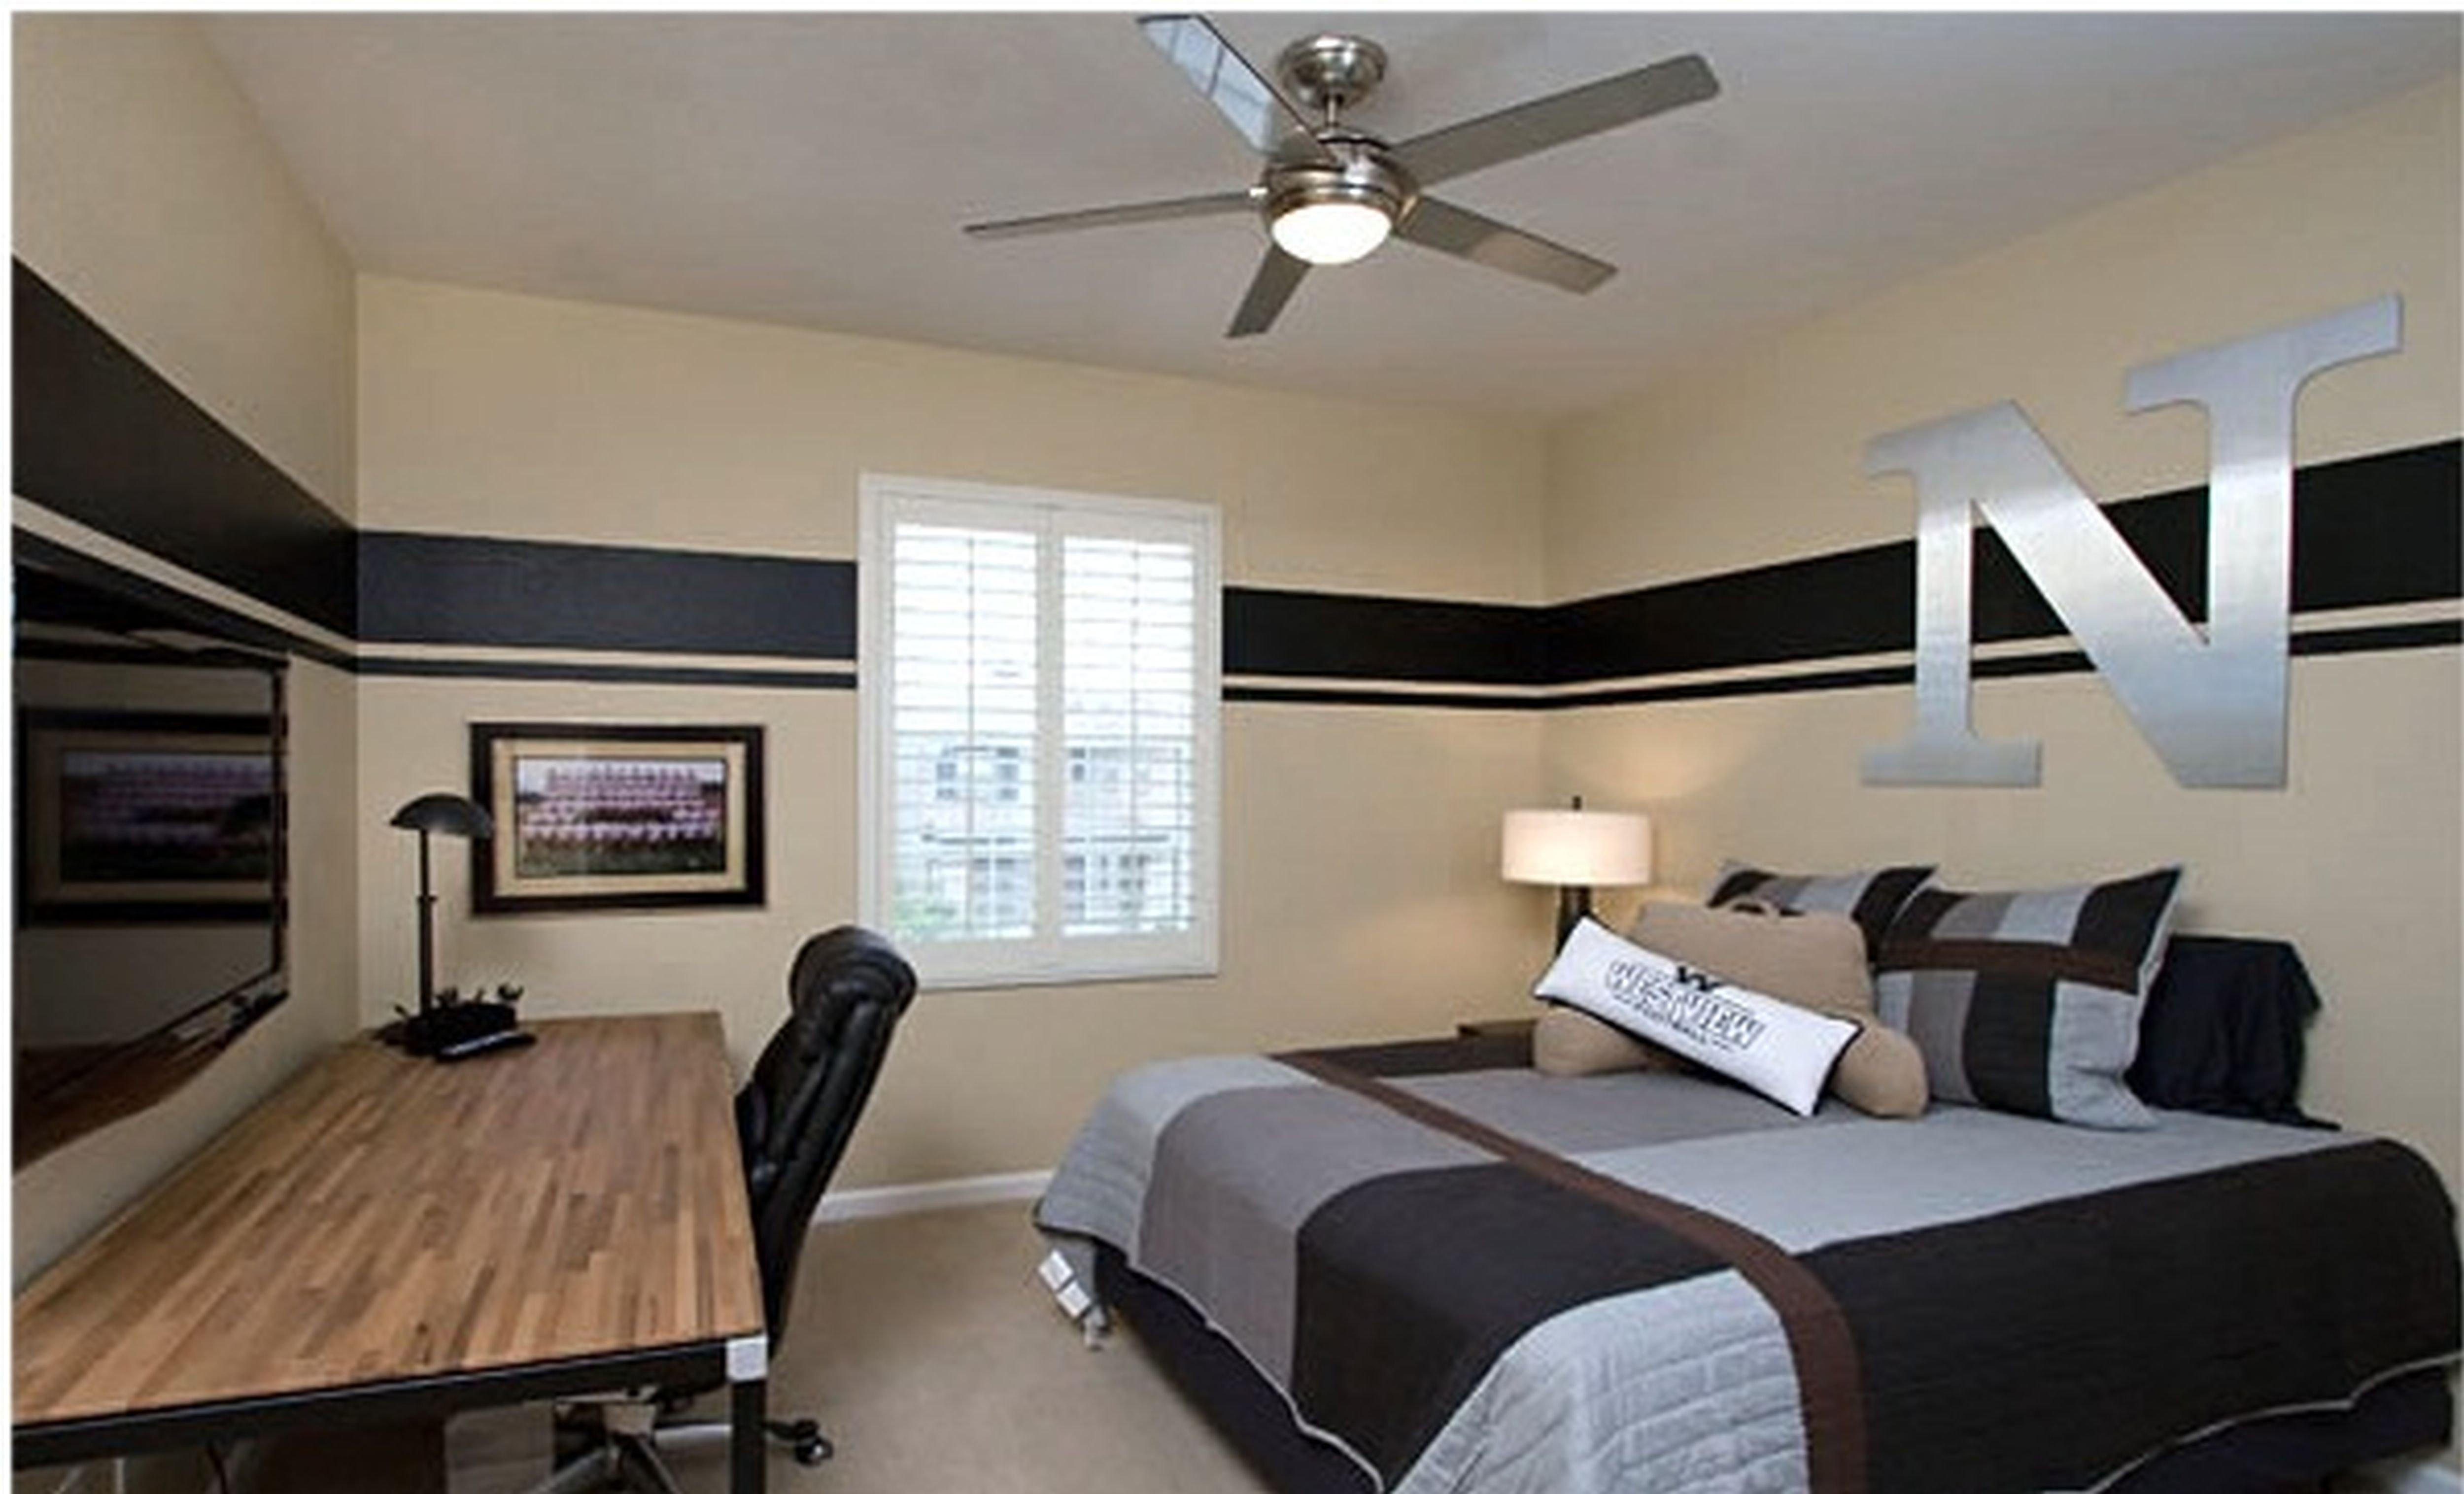 10 Great Room Design Ideas For Guys bedroom mesmerizing marvelous cool room designs for guys cool mens 2020